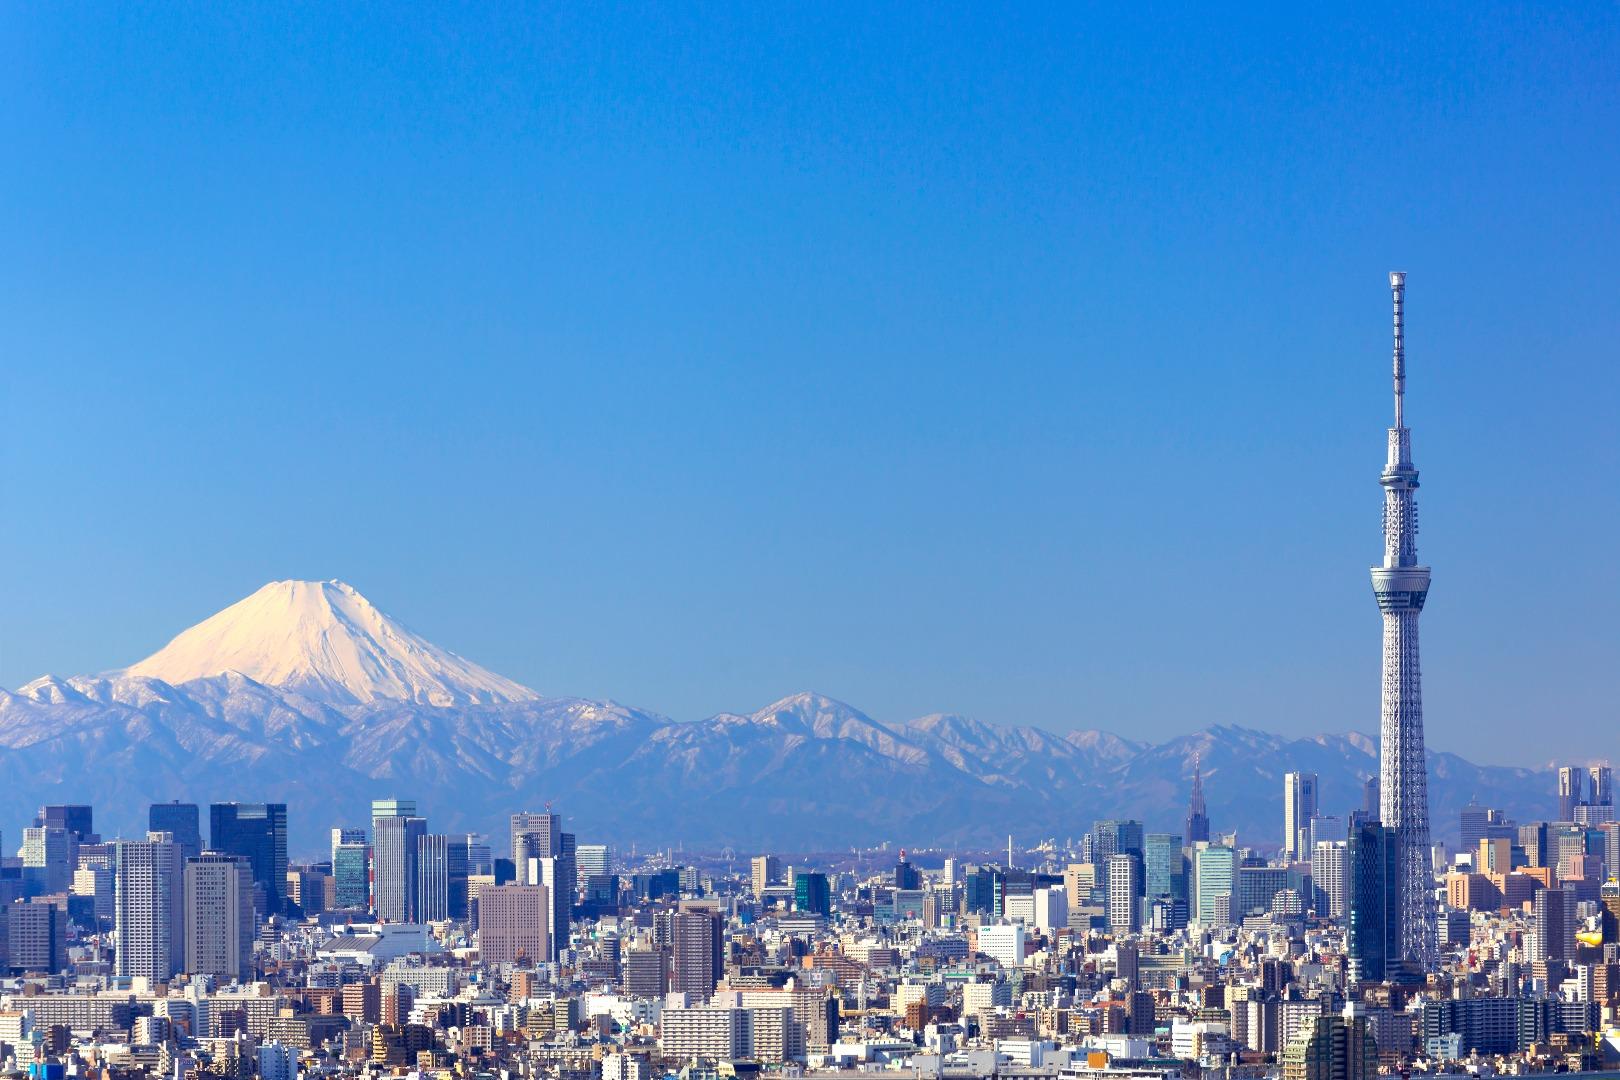 Sale Fuji Lake Kawaguchi Oshino Hakkai And Gotemba Premium Outlets Day Trip From Tokyo Sale 9 Ticket Kd